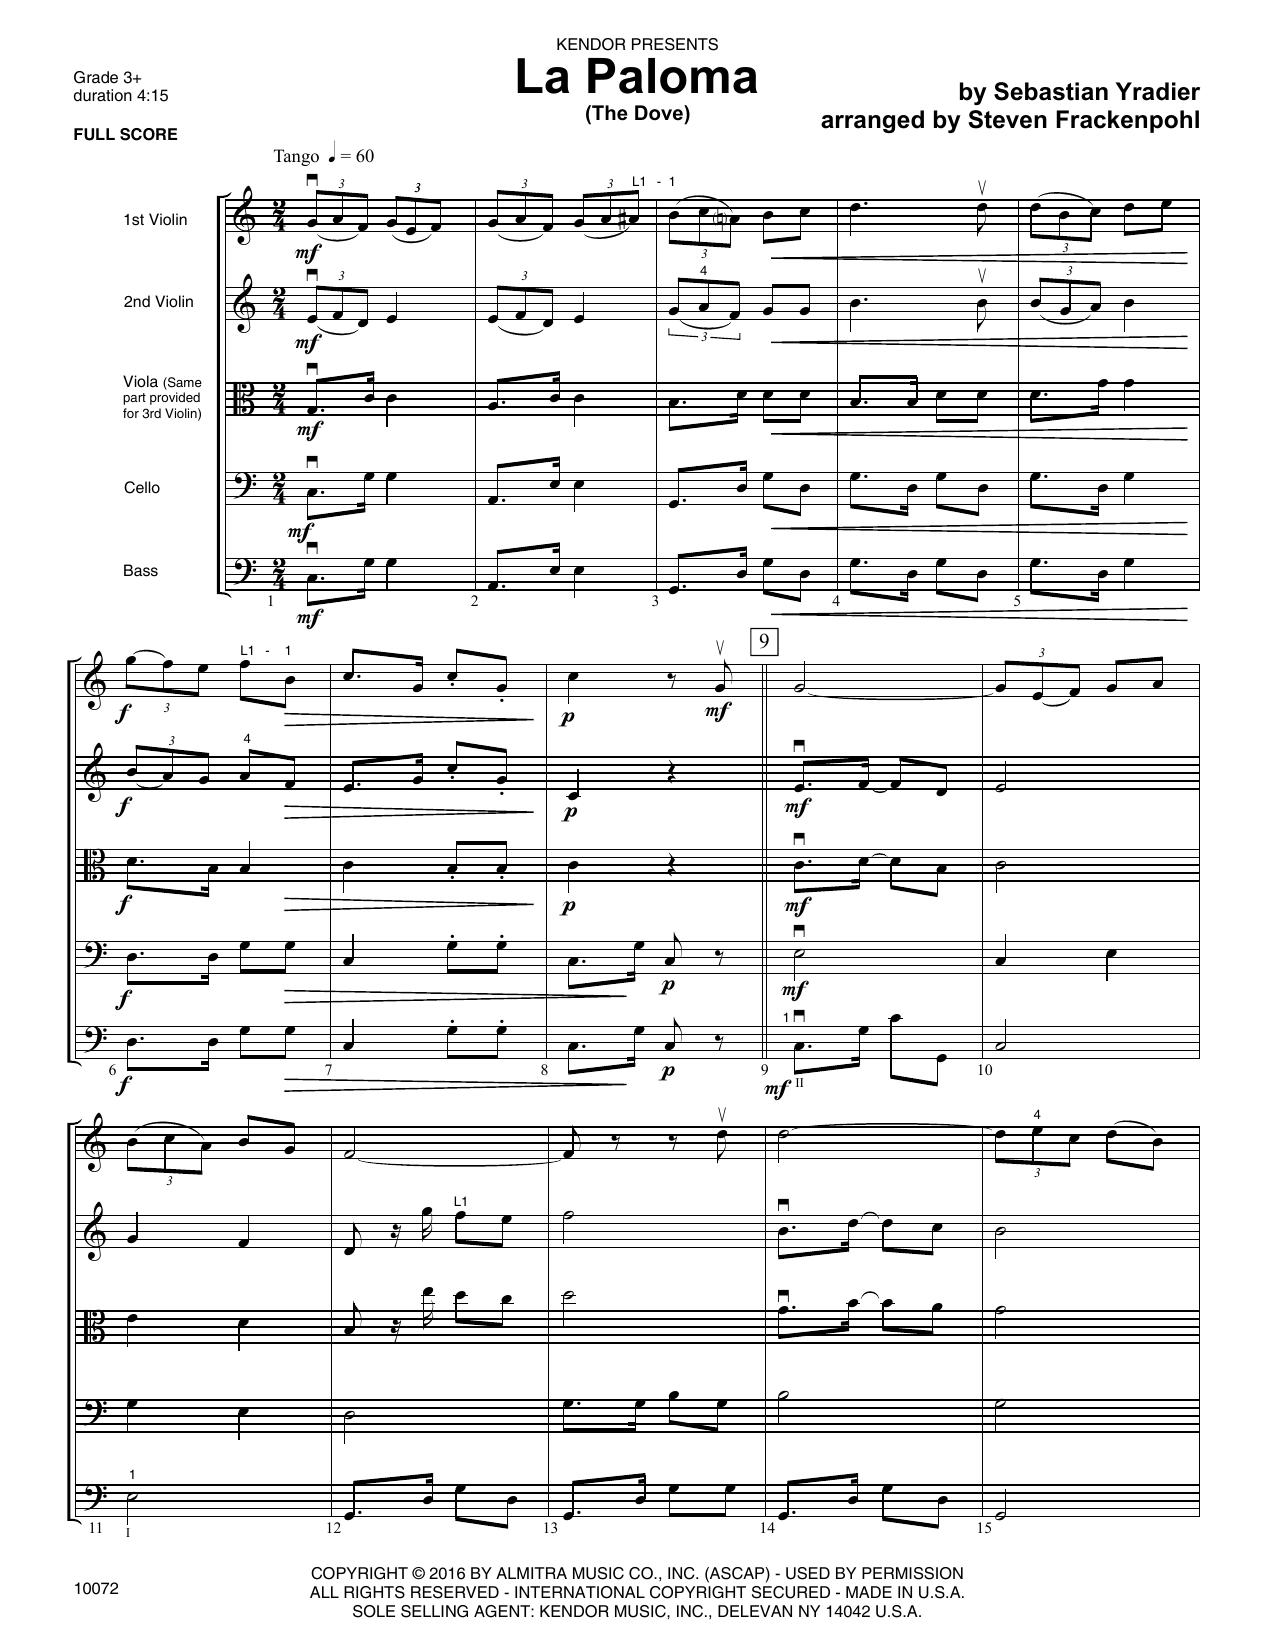 La Paloma (The Dove) - Full Score